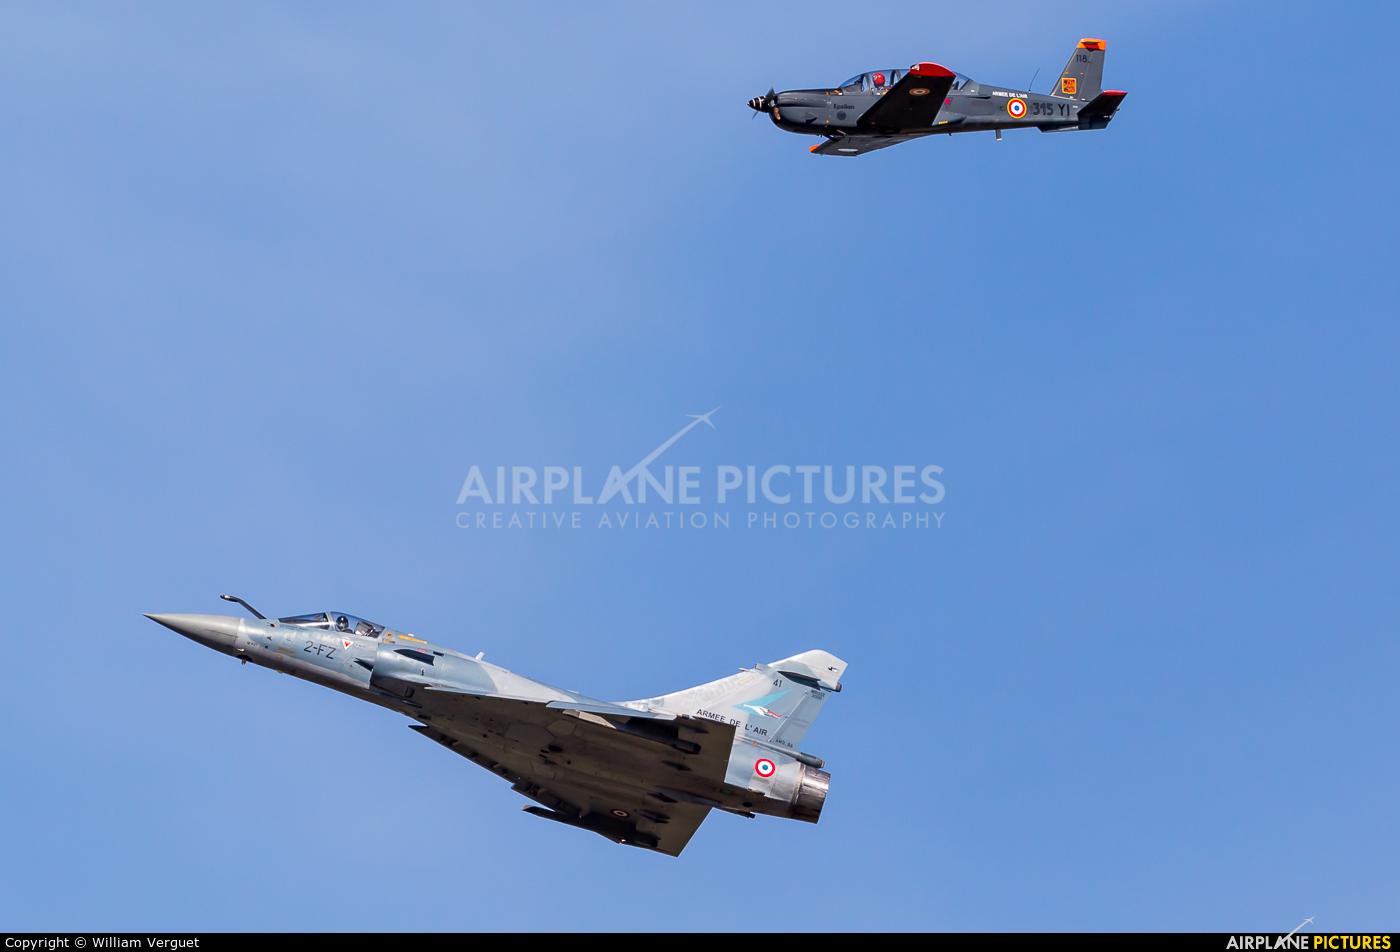 France - Air Force 41 aircraft at Morlaix Ploujean Airport